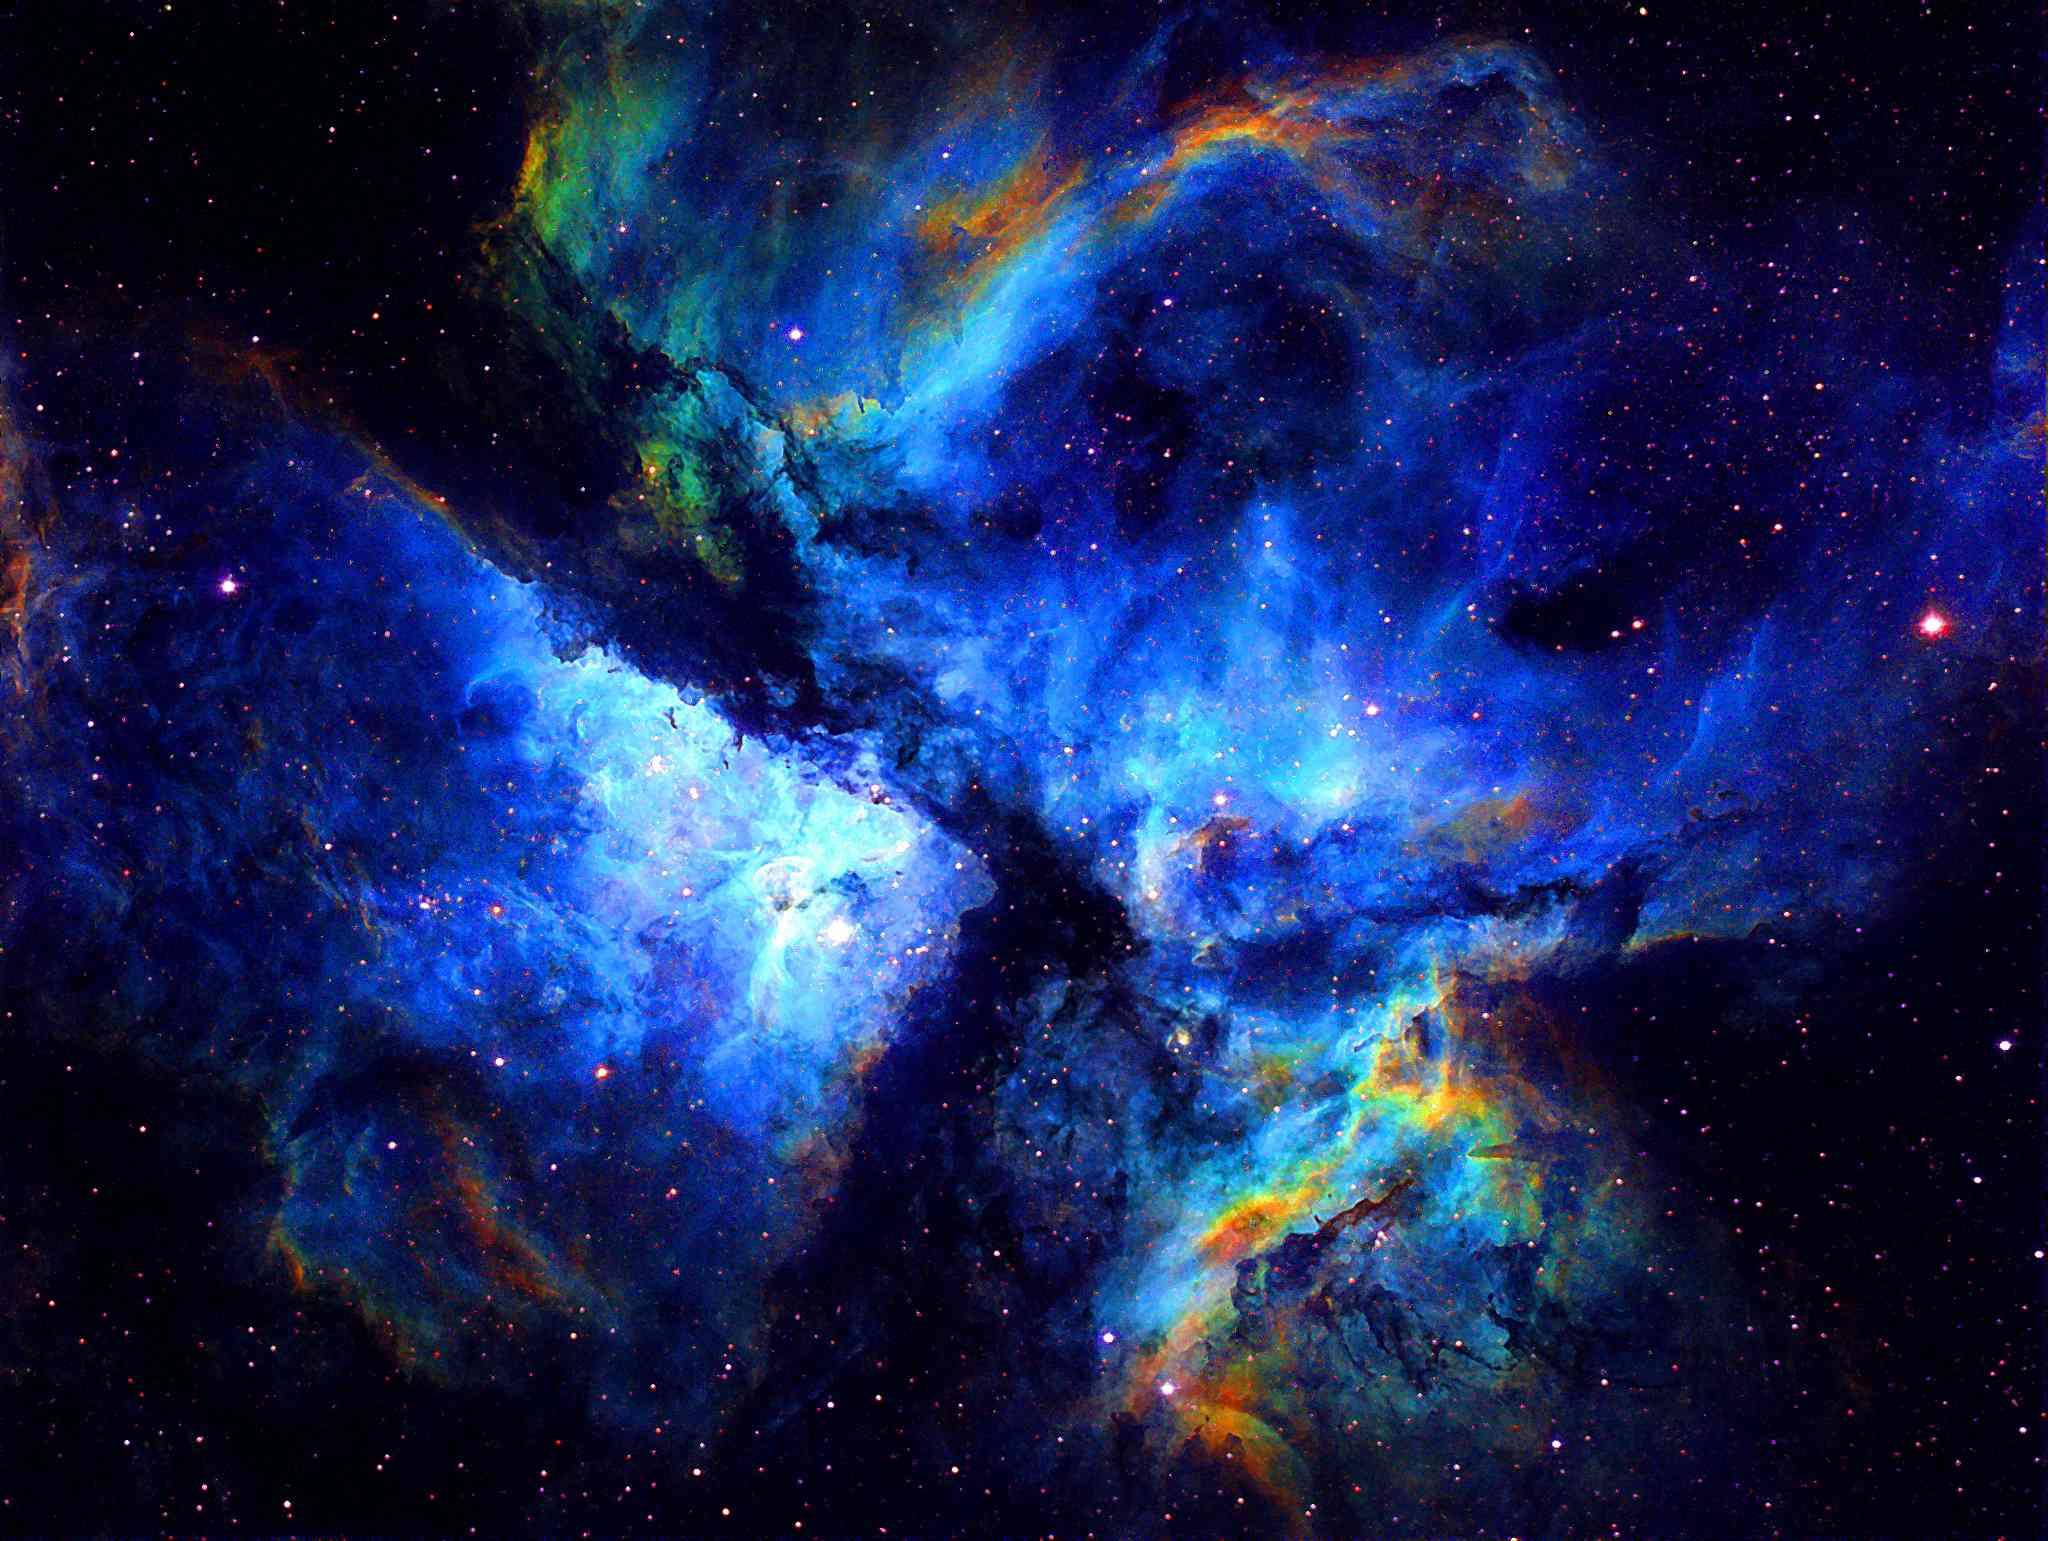 Oxygen in the Carina nebula.